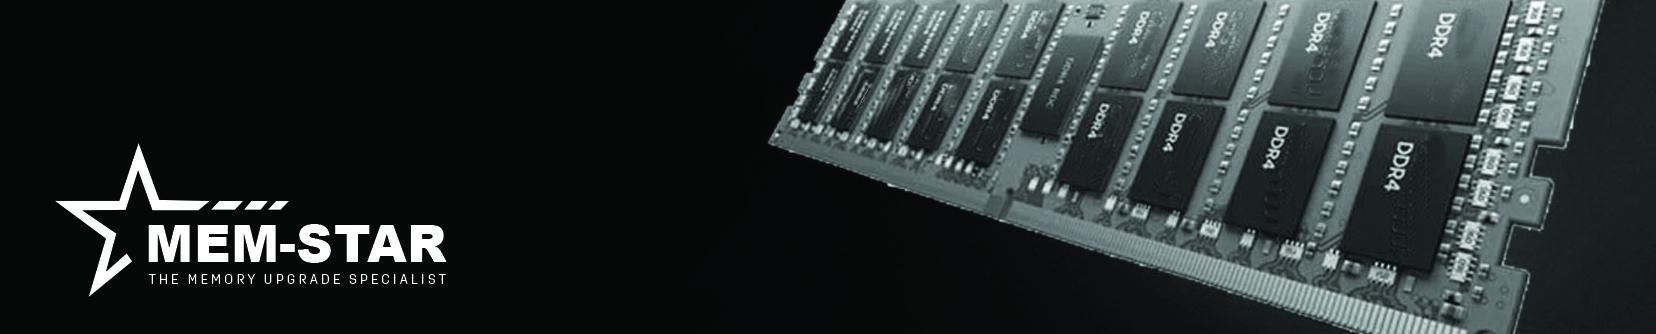 Mem-Star Server Memory